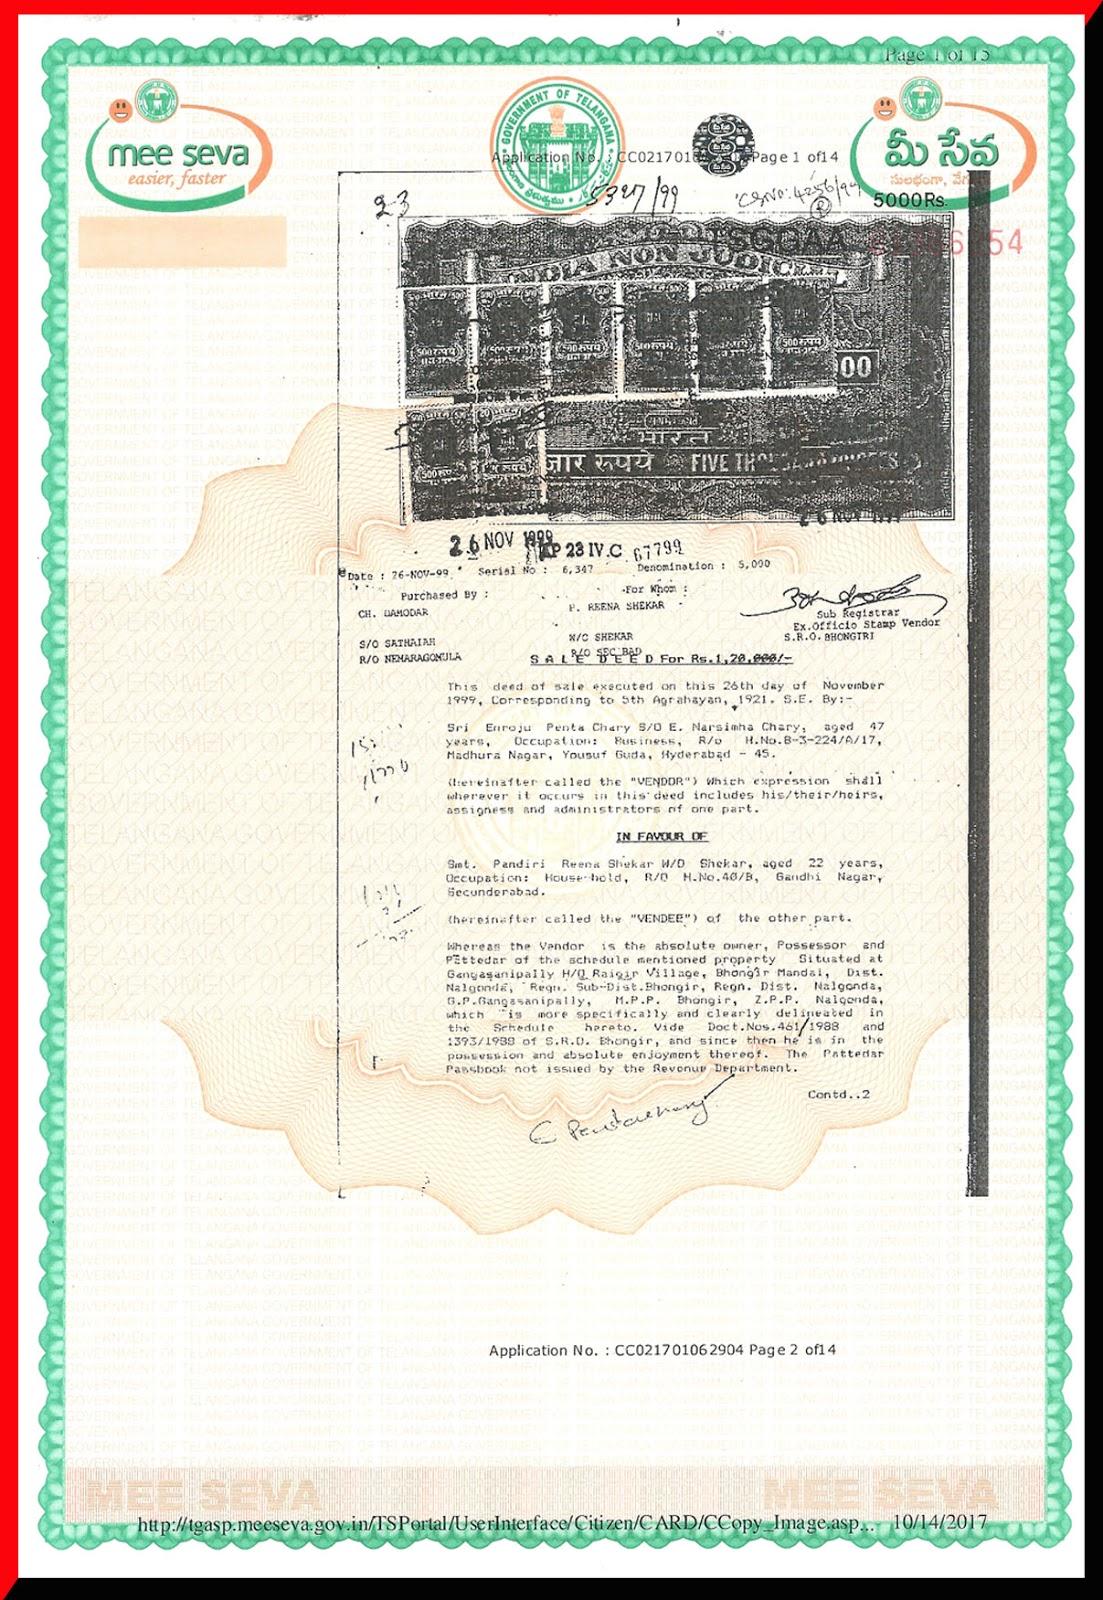 Sale Deed No. 5327-1999-ASD